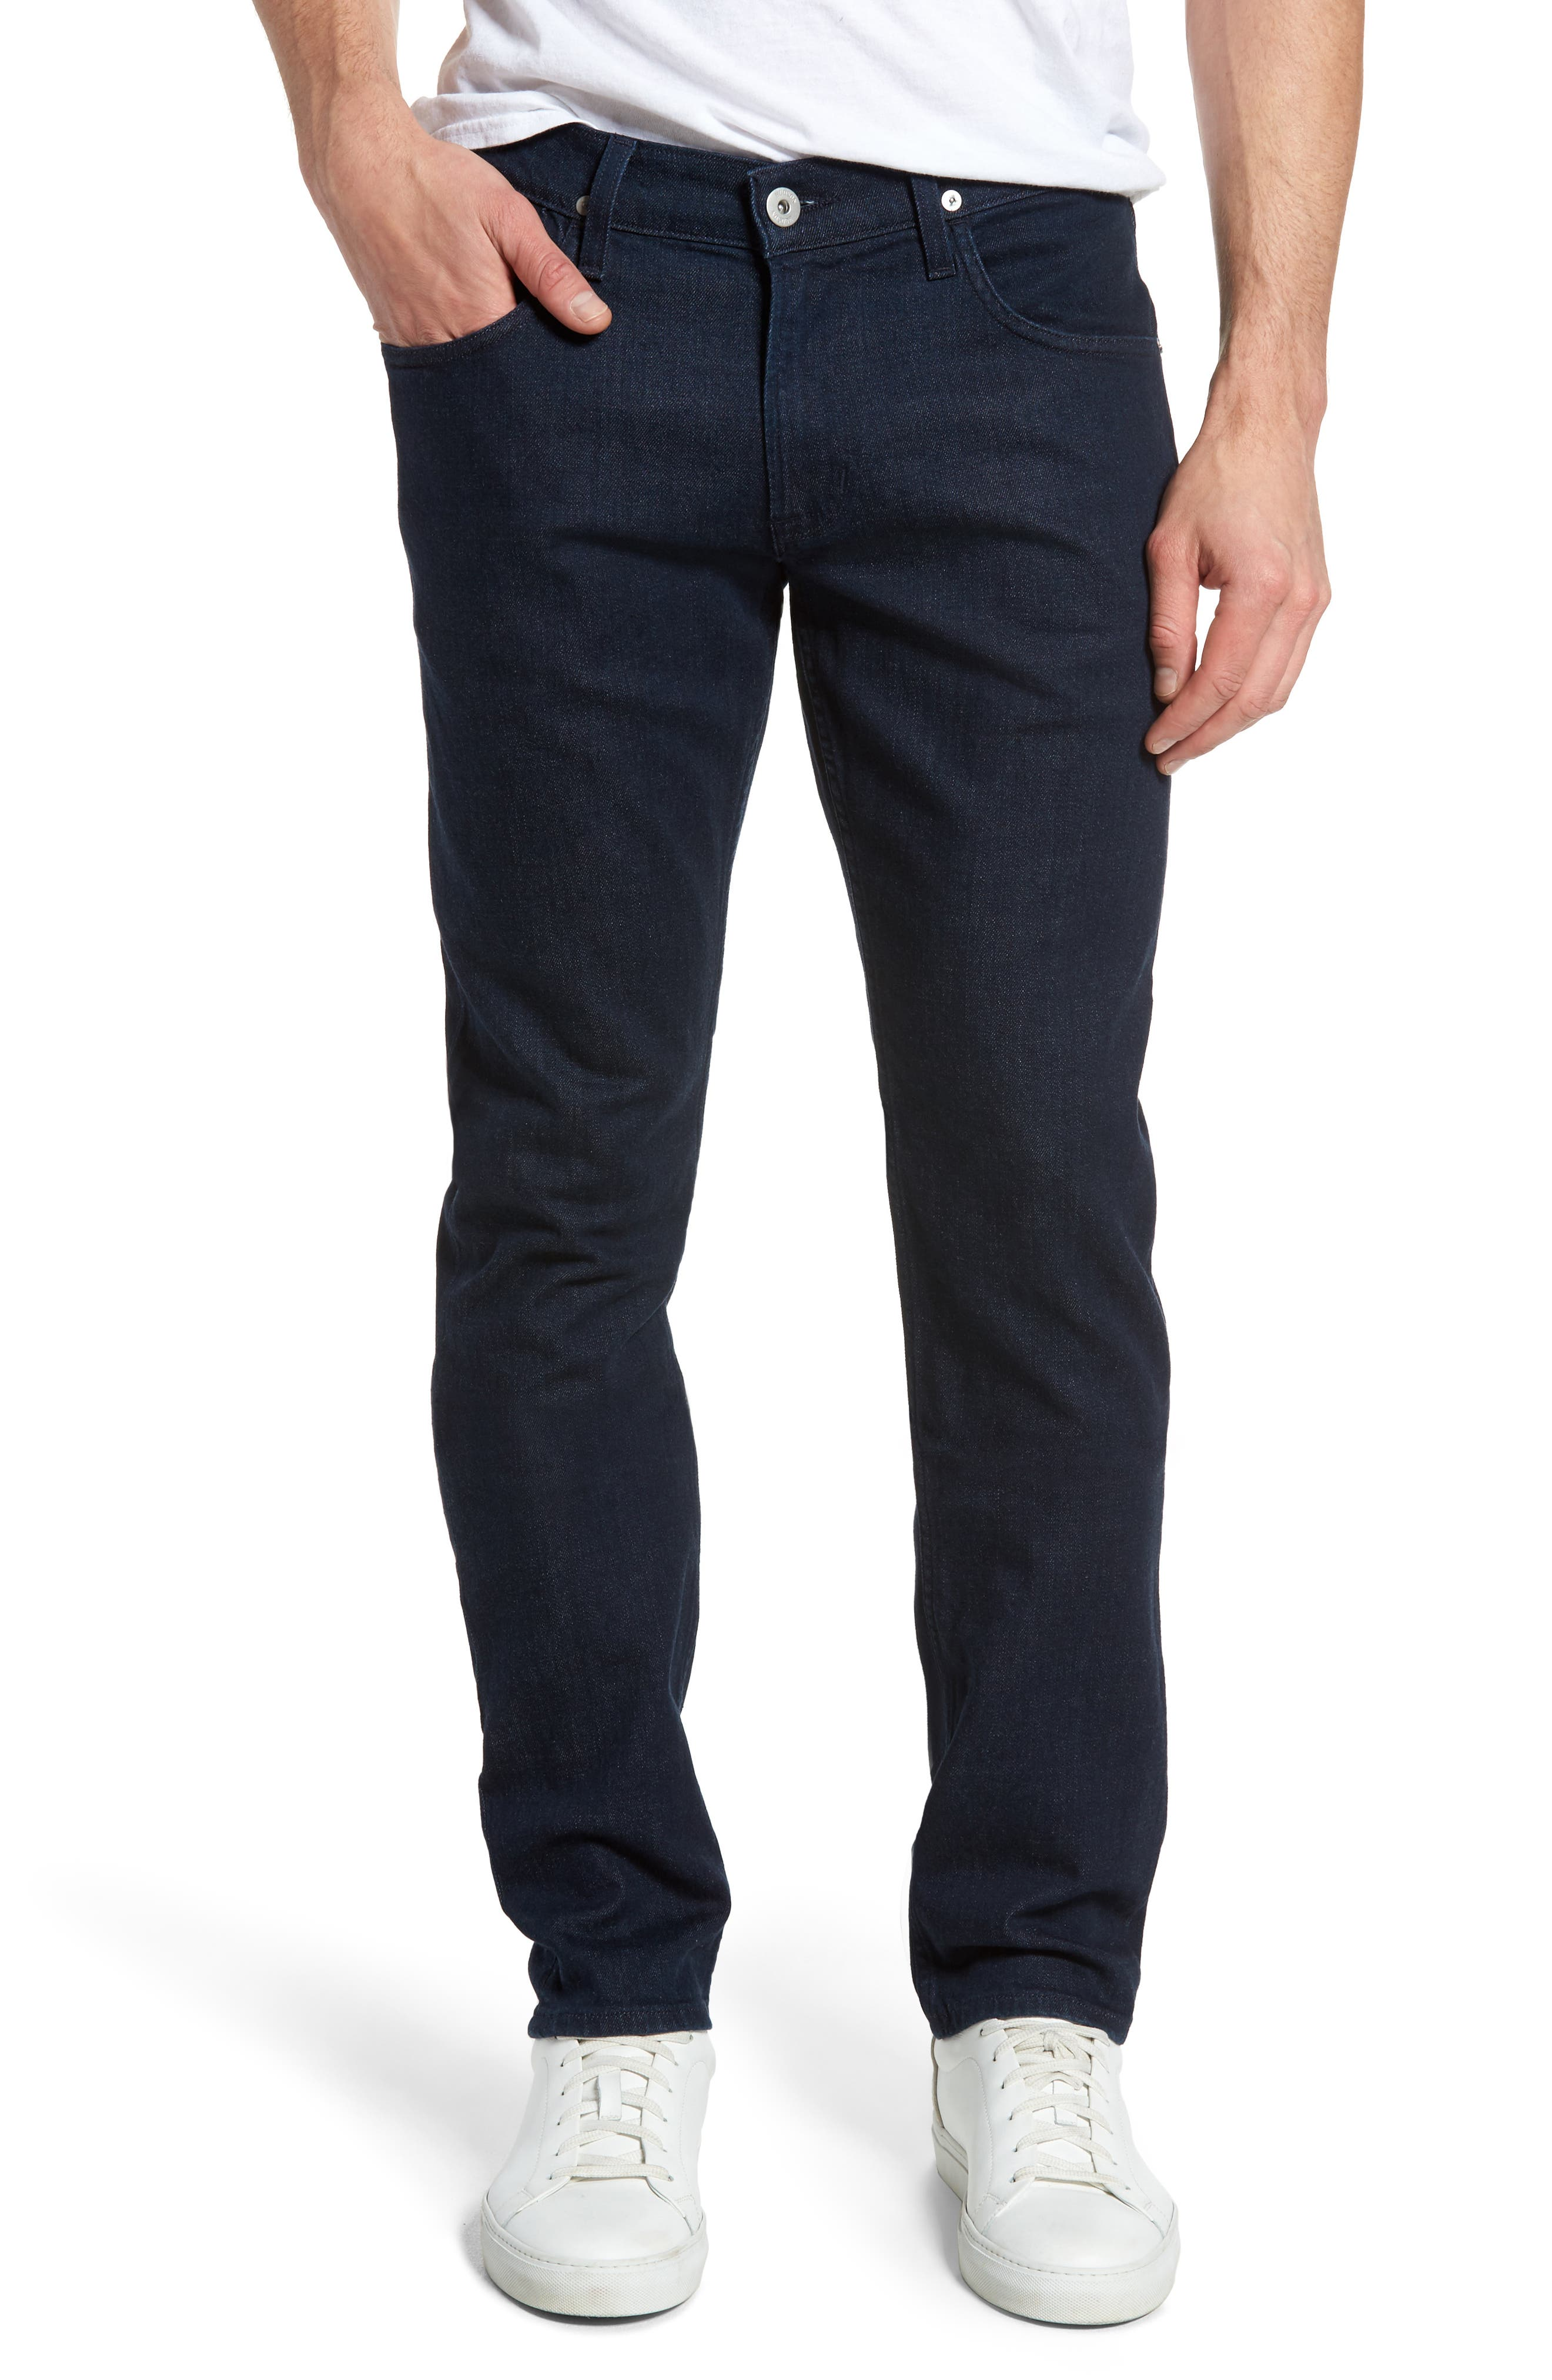 Blake Slim Fit Jeans,                         Main,                         color, Firebrand